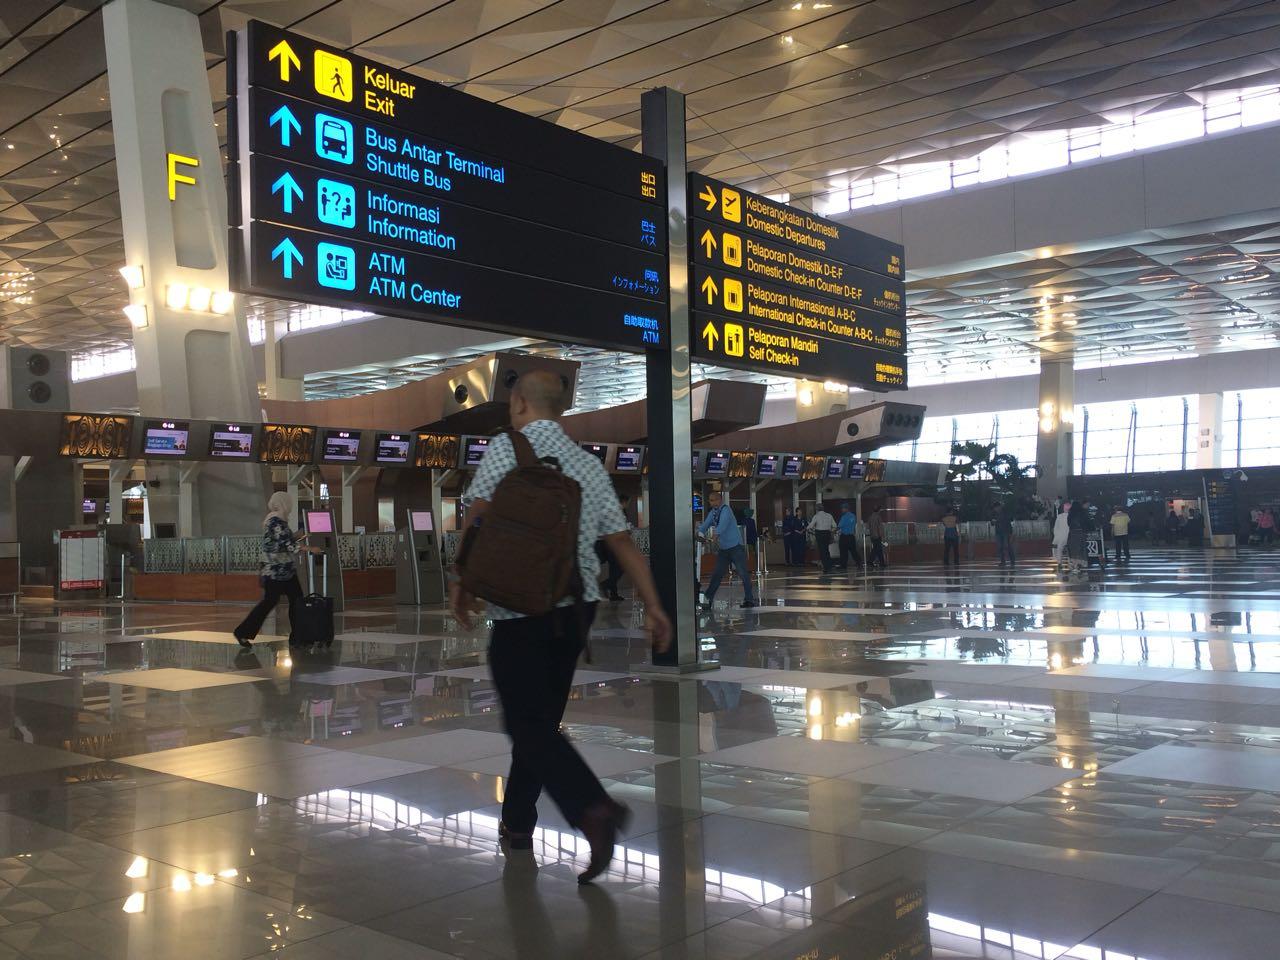 https: img-o.okeinfo.net content 2018 12 21 608 1994174 libur-natal-dan-tahun-baru-jumlah-penumpang-di-bandara-kualanamu-naik-11-persen-qG6bTUzpAz.jpg